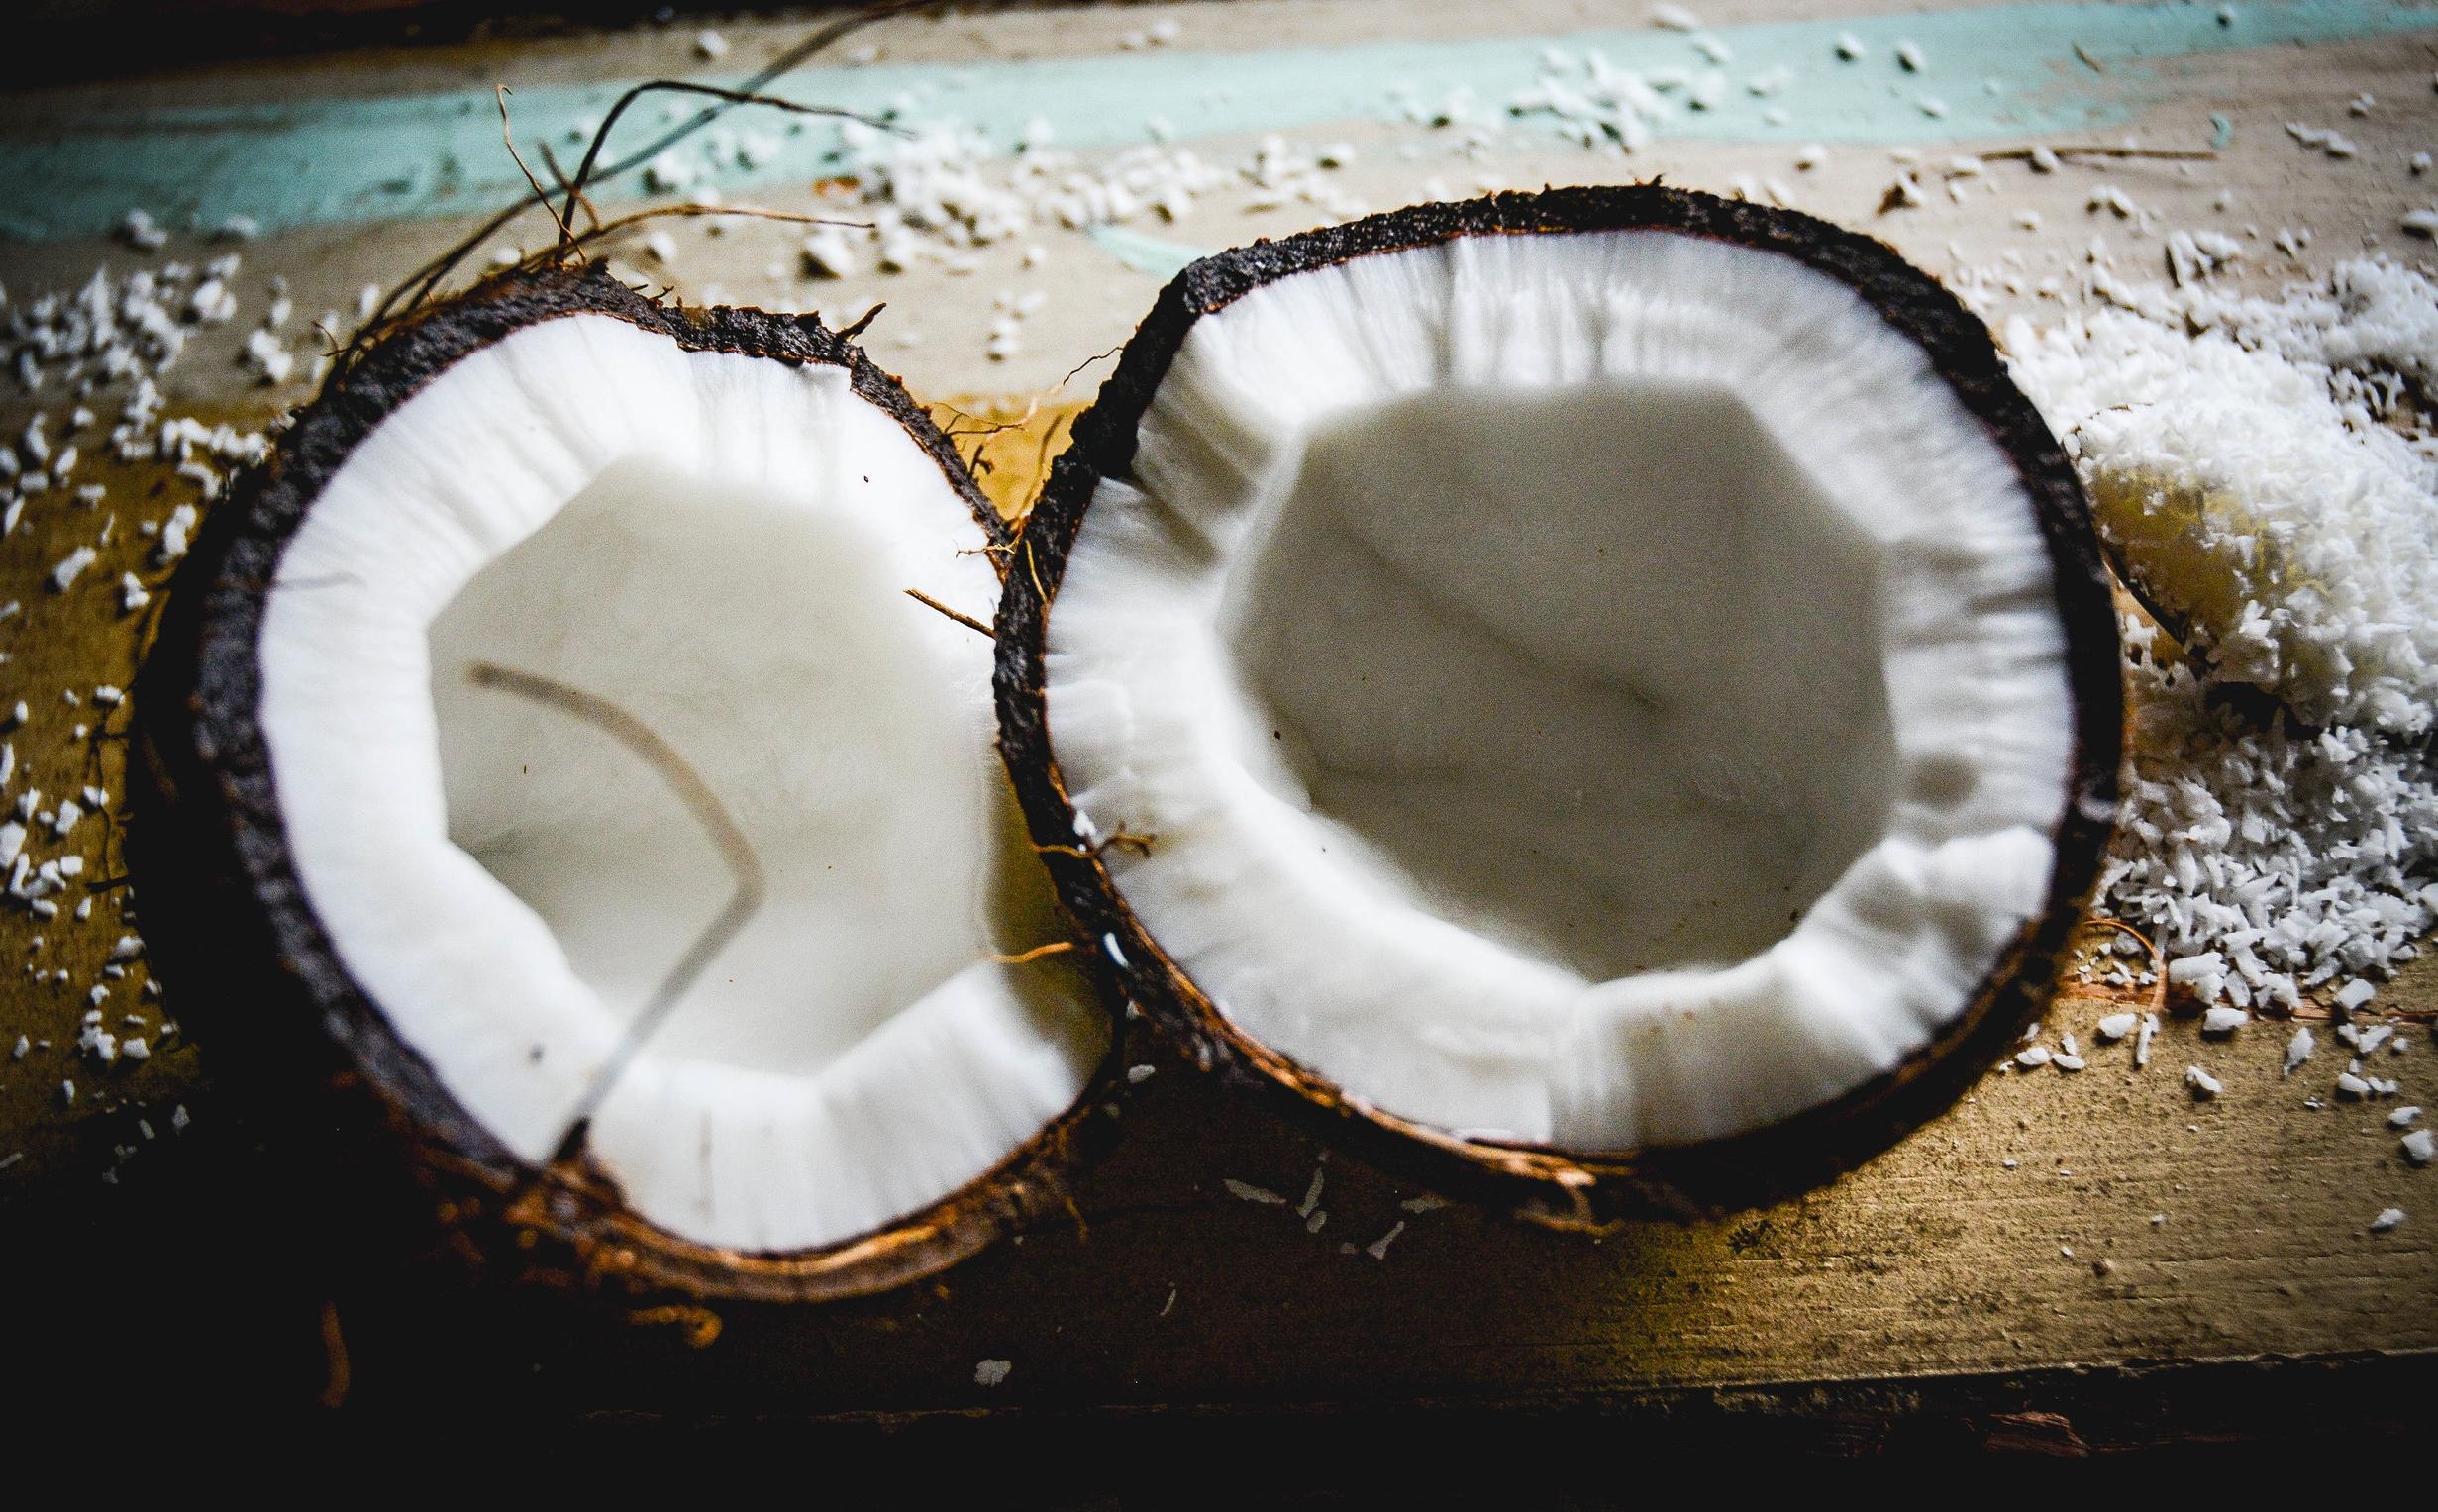 two coconut halves